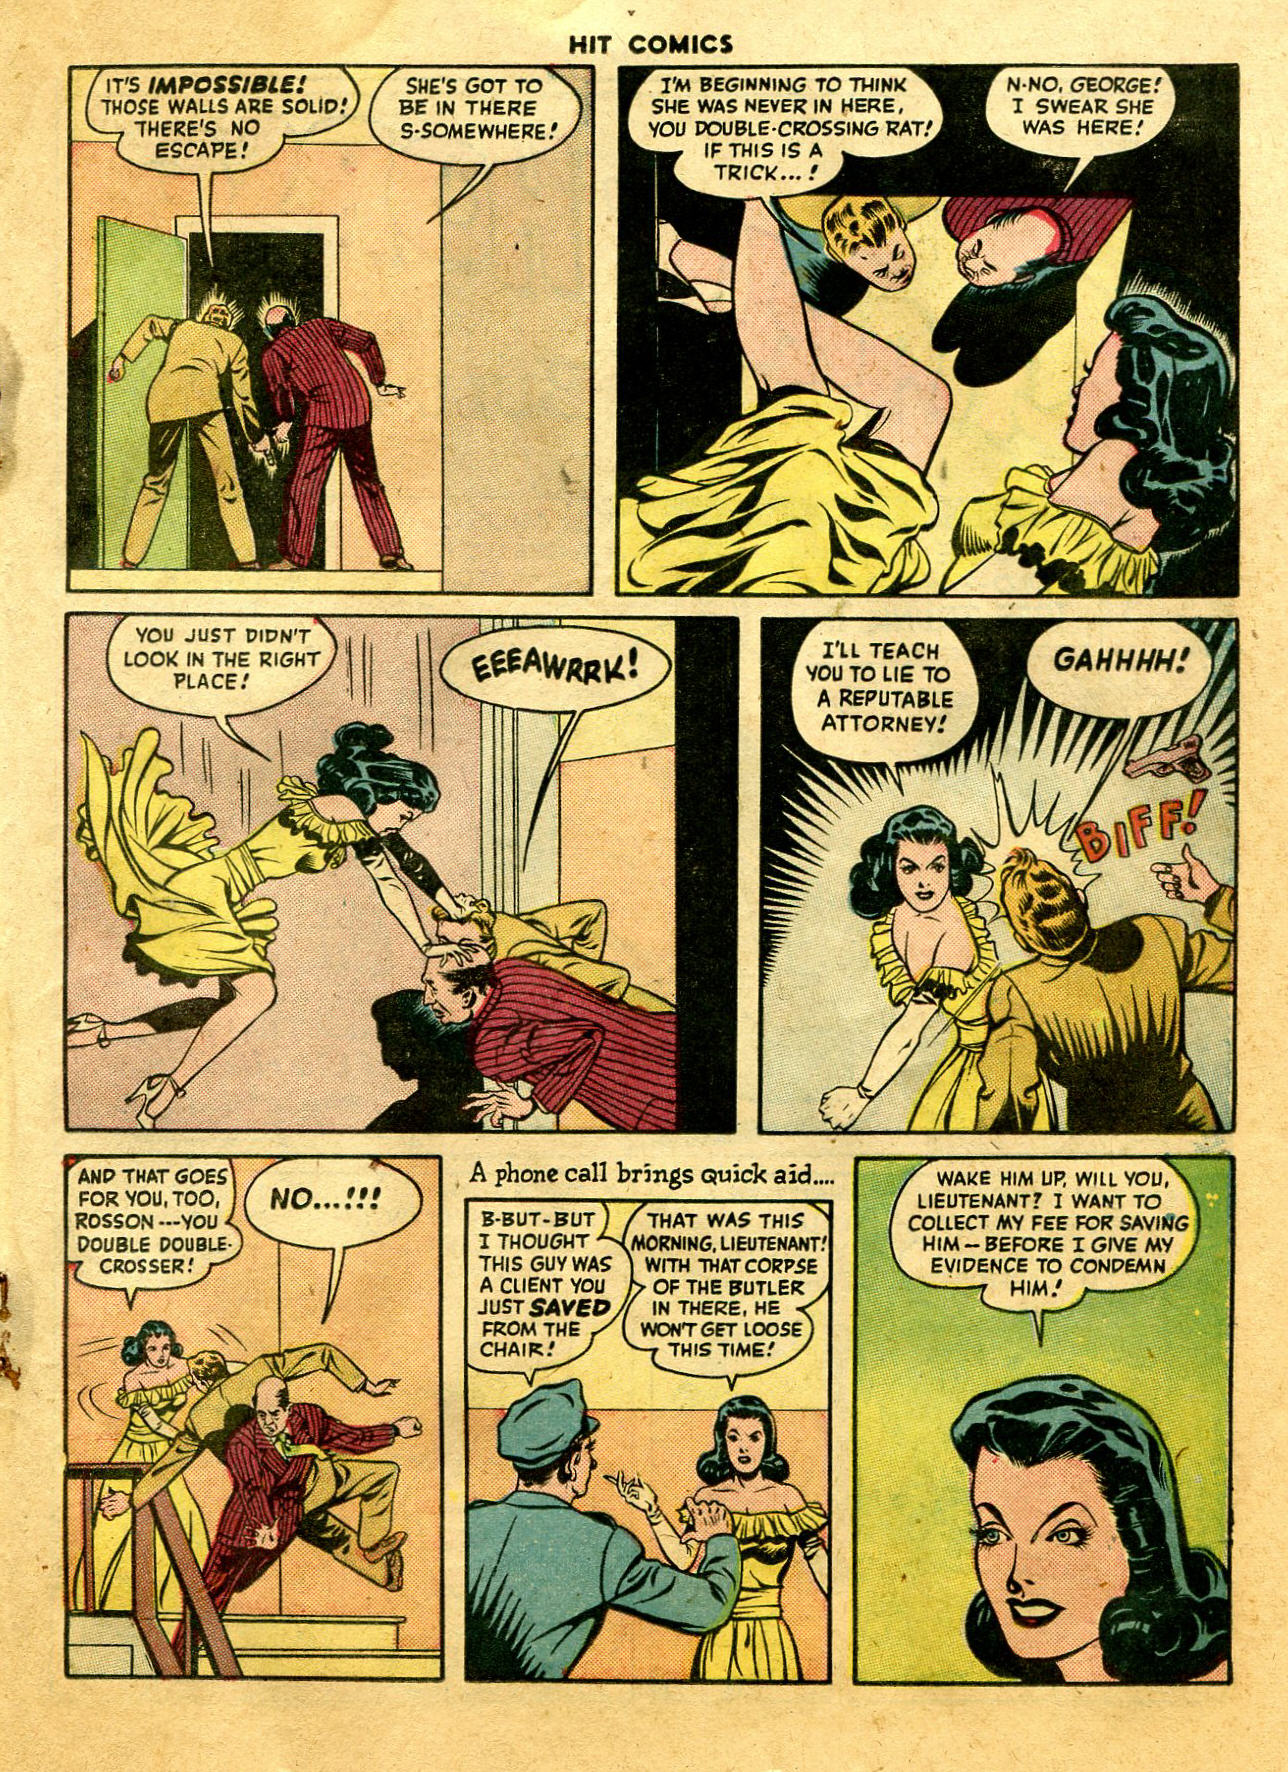 Read online Hit Comics comic -  Issue #44 - 37